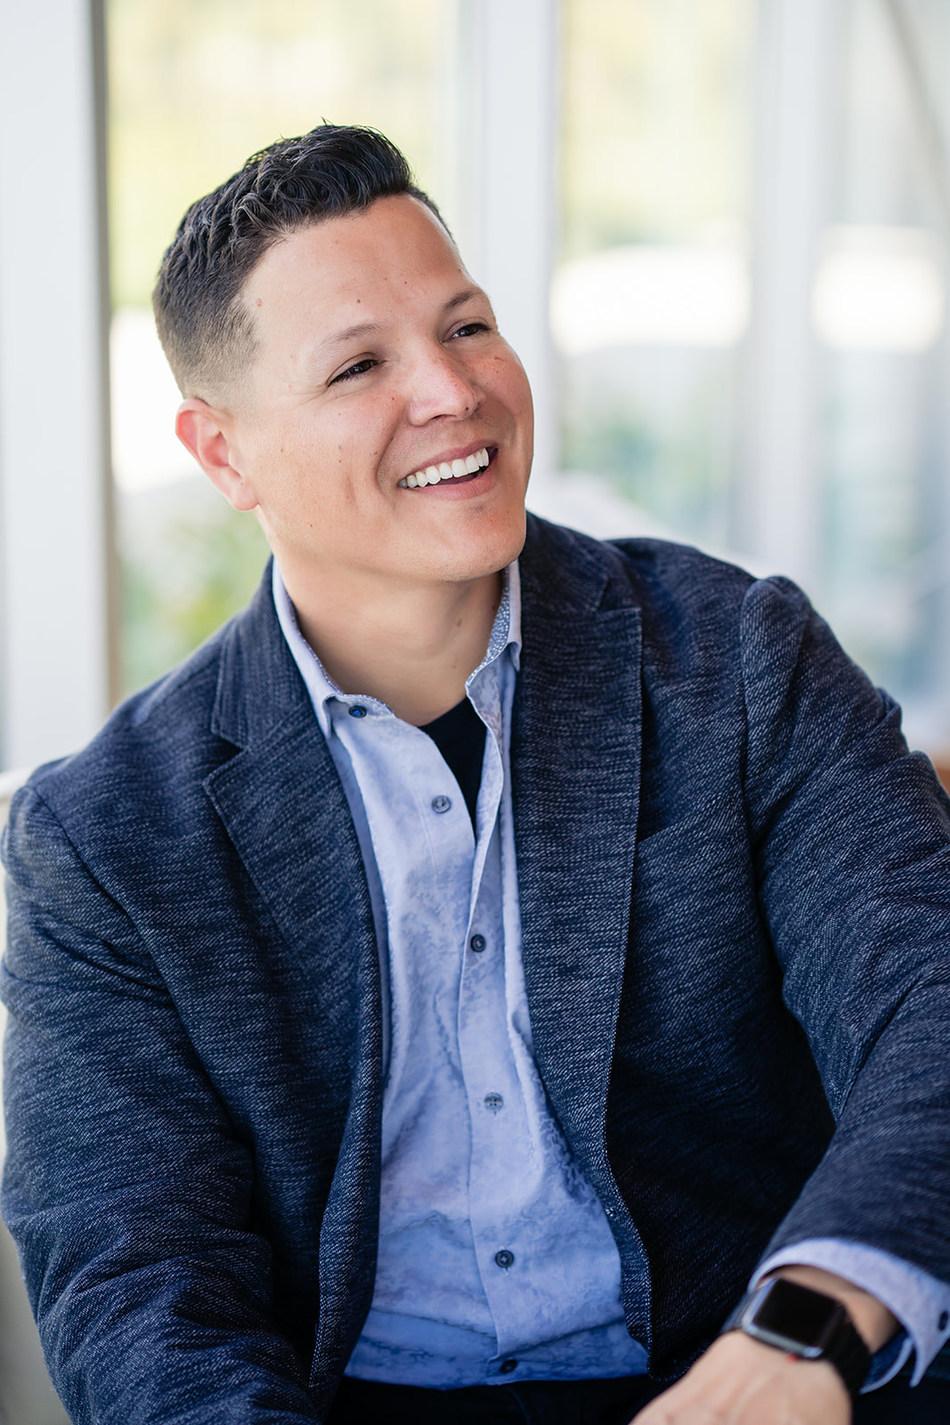 Joseph Ruiz | Co-founder